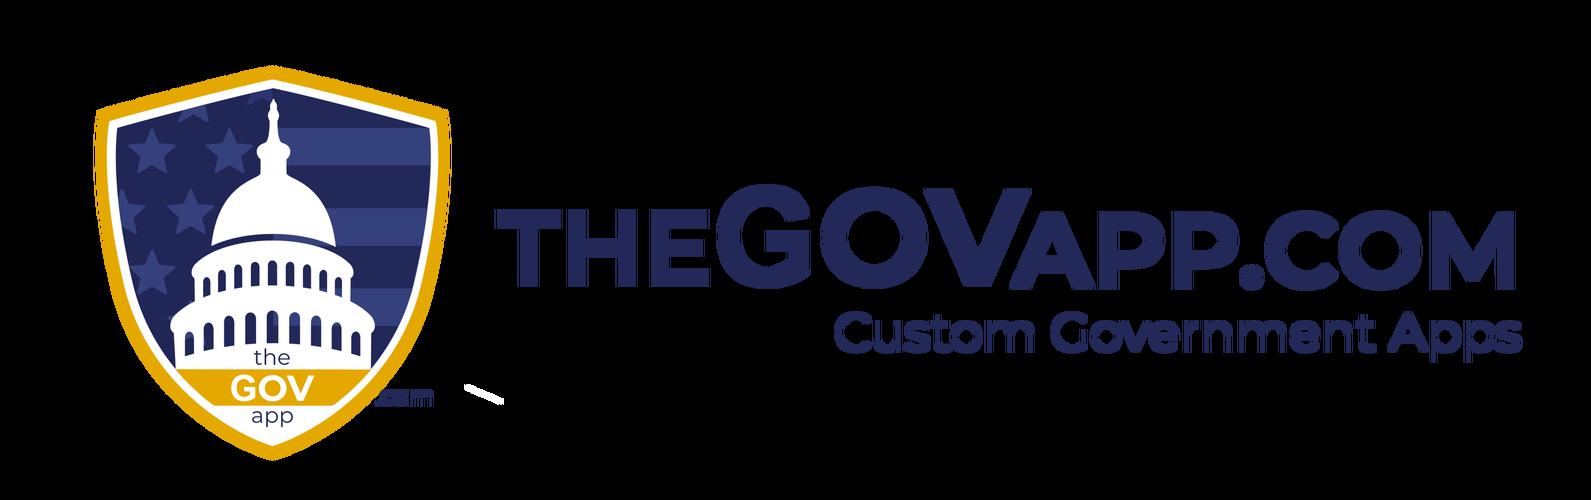 The GovApp